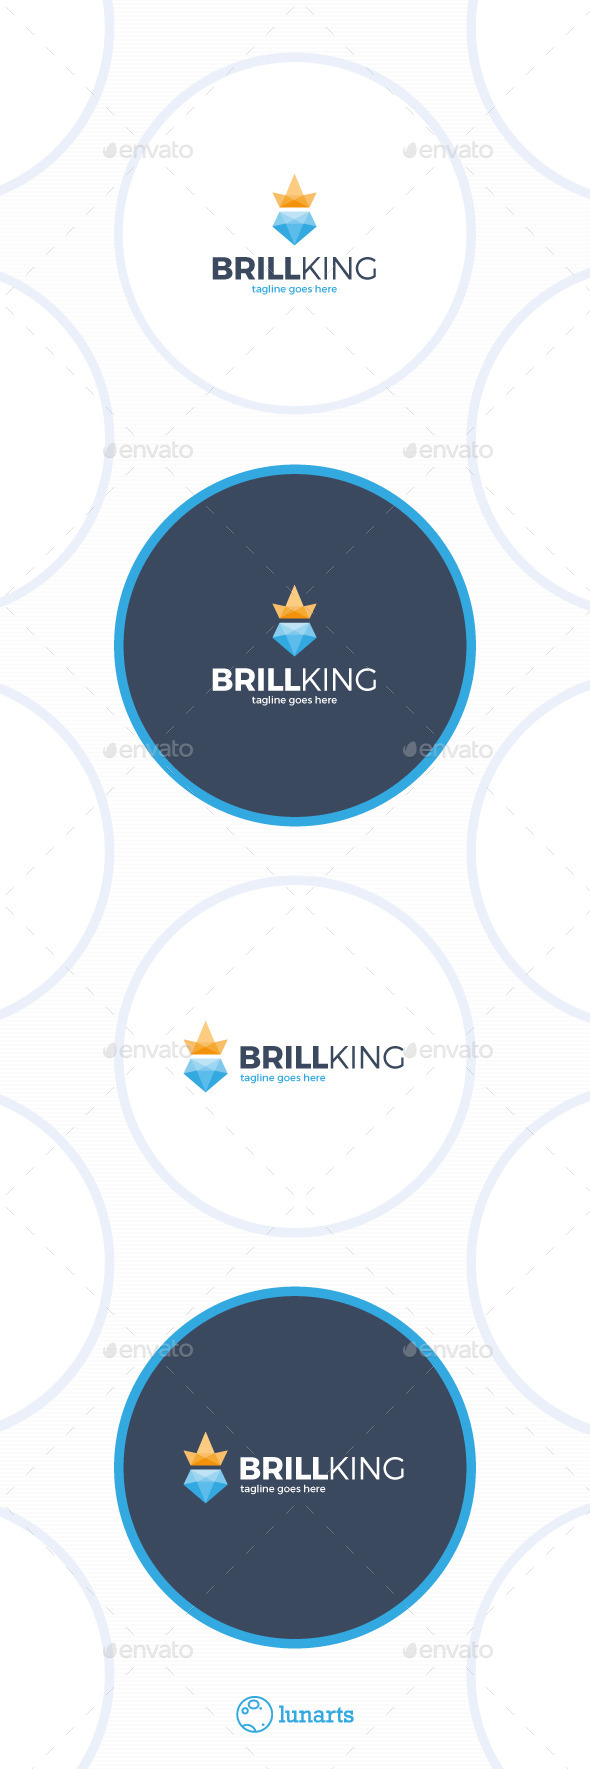 Brilliant King Logo